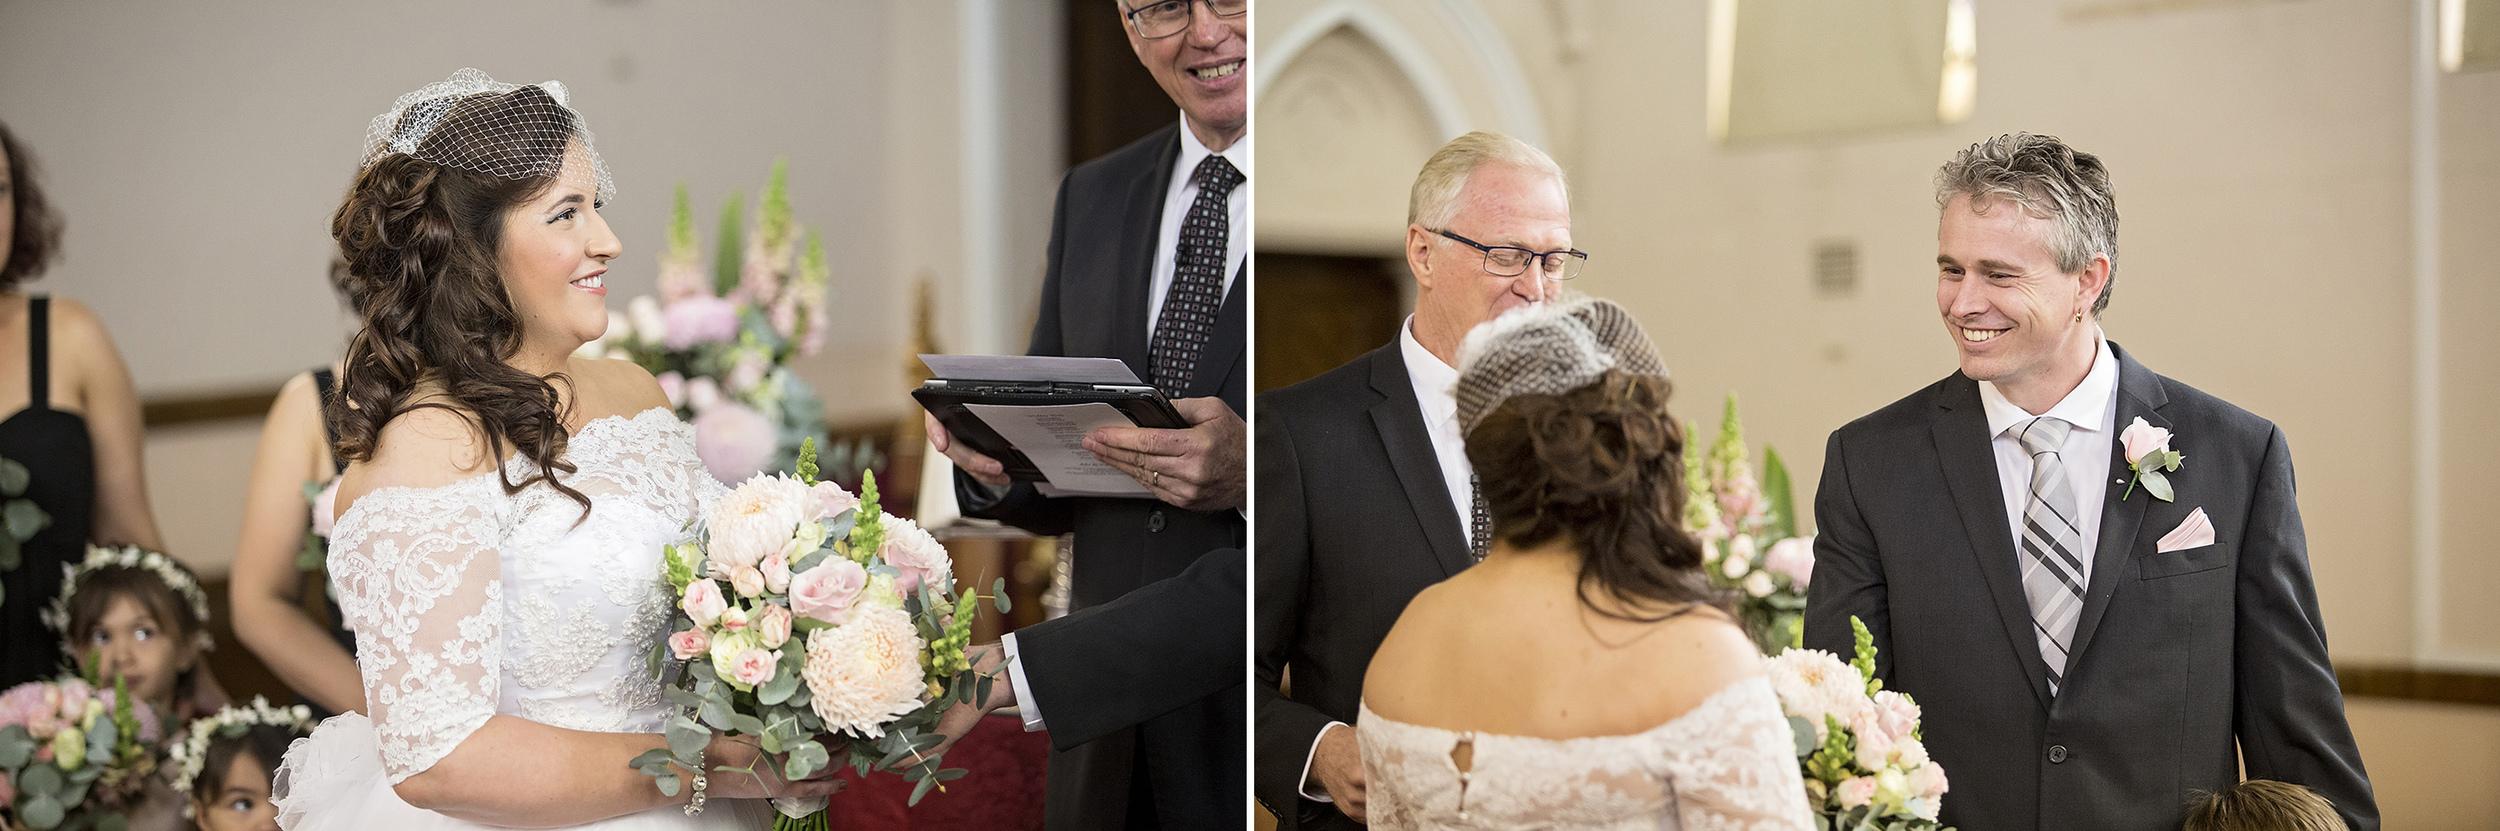 Adelaide Family Wedding Photography 07.jpg